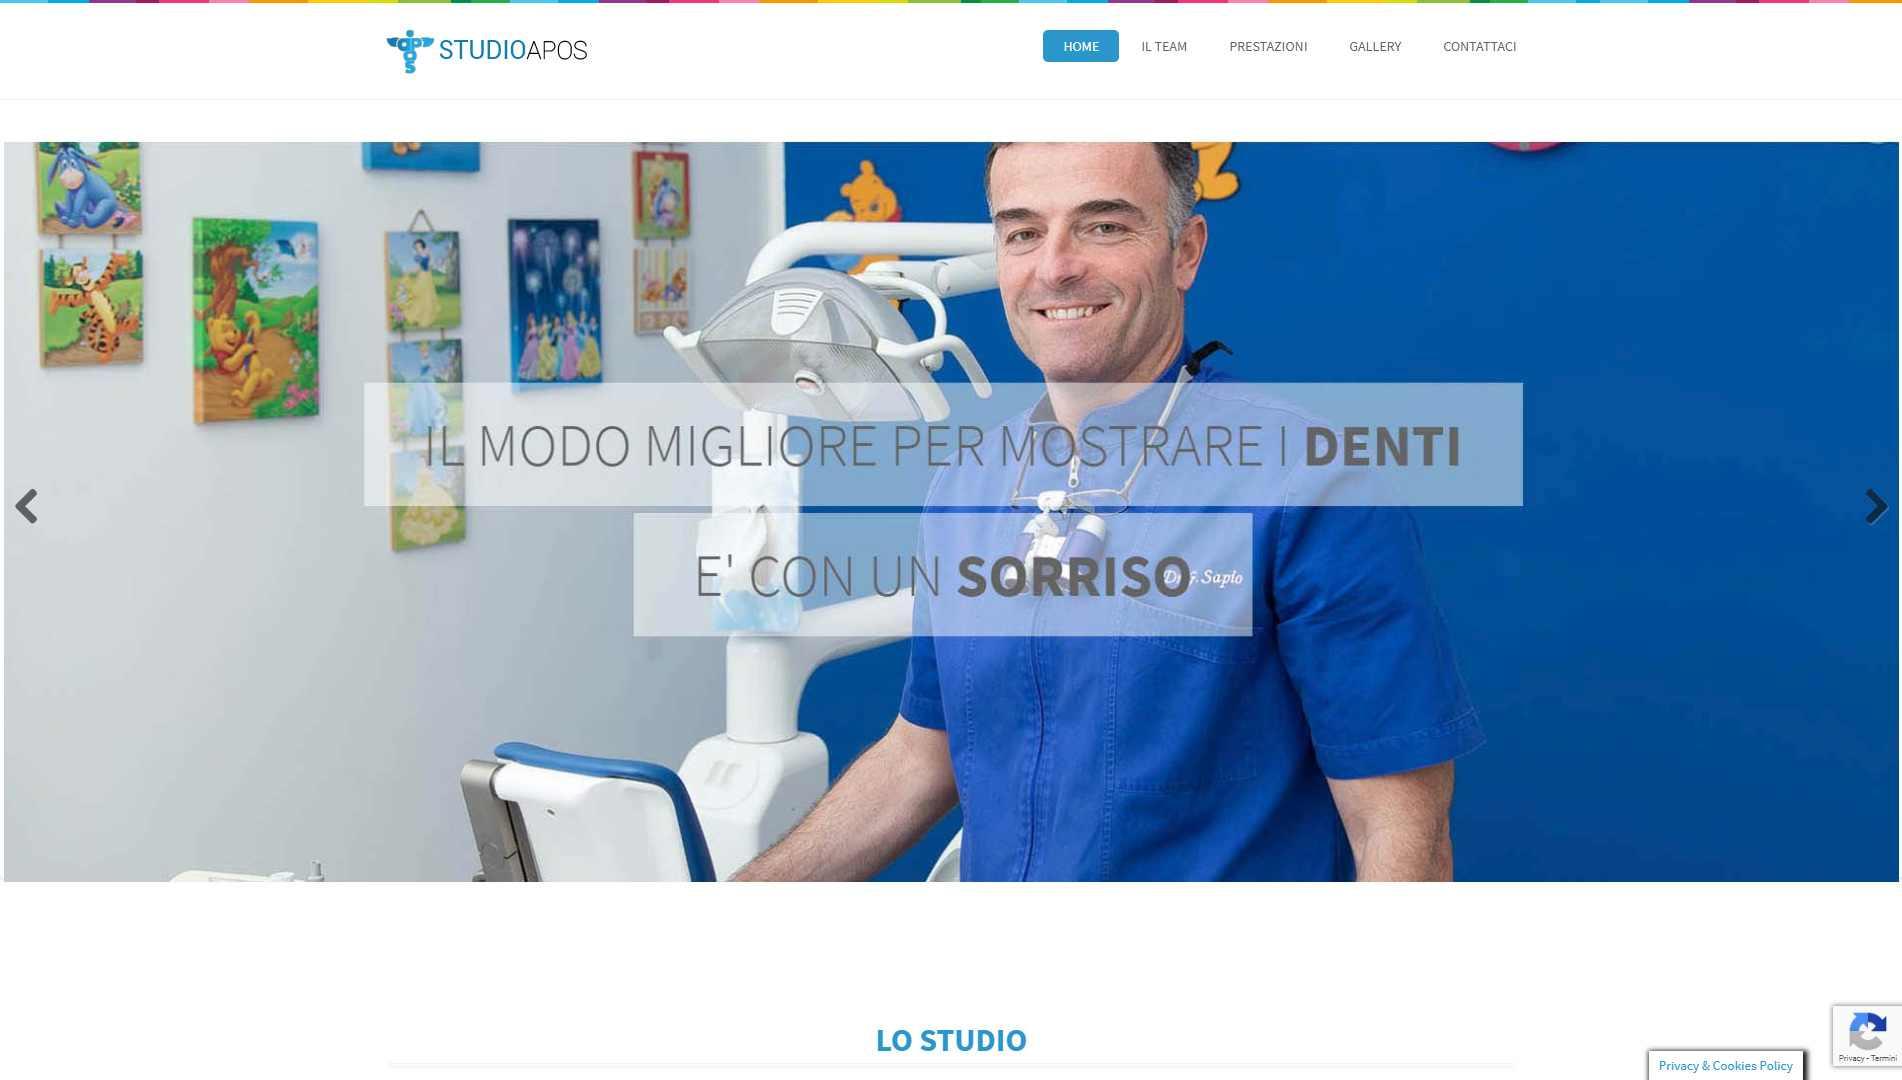 Sito Web Dentista Studio APOS Dott Sapio a Benevento